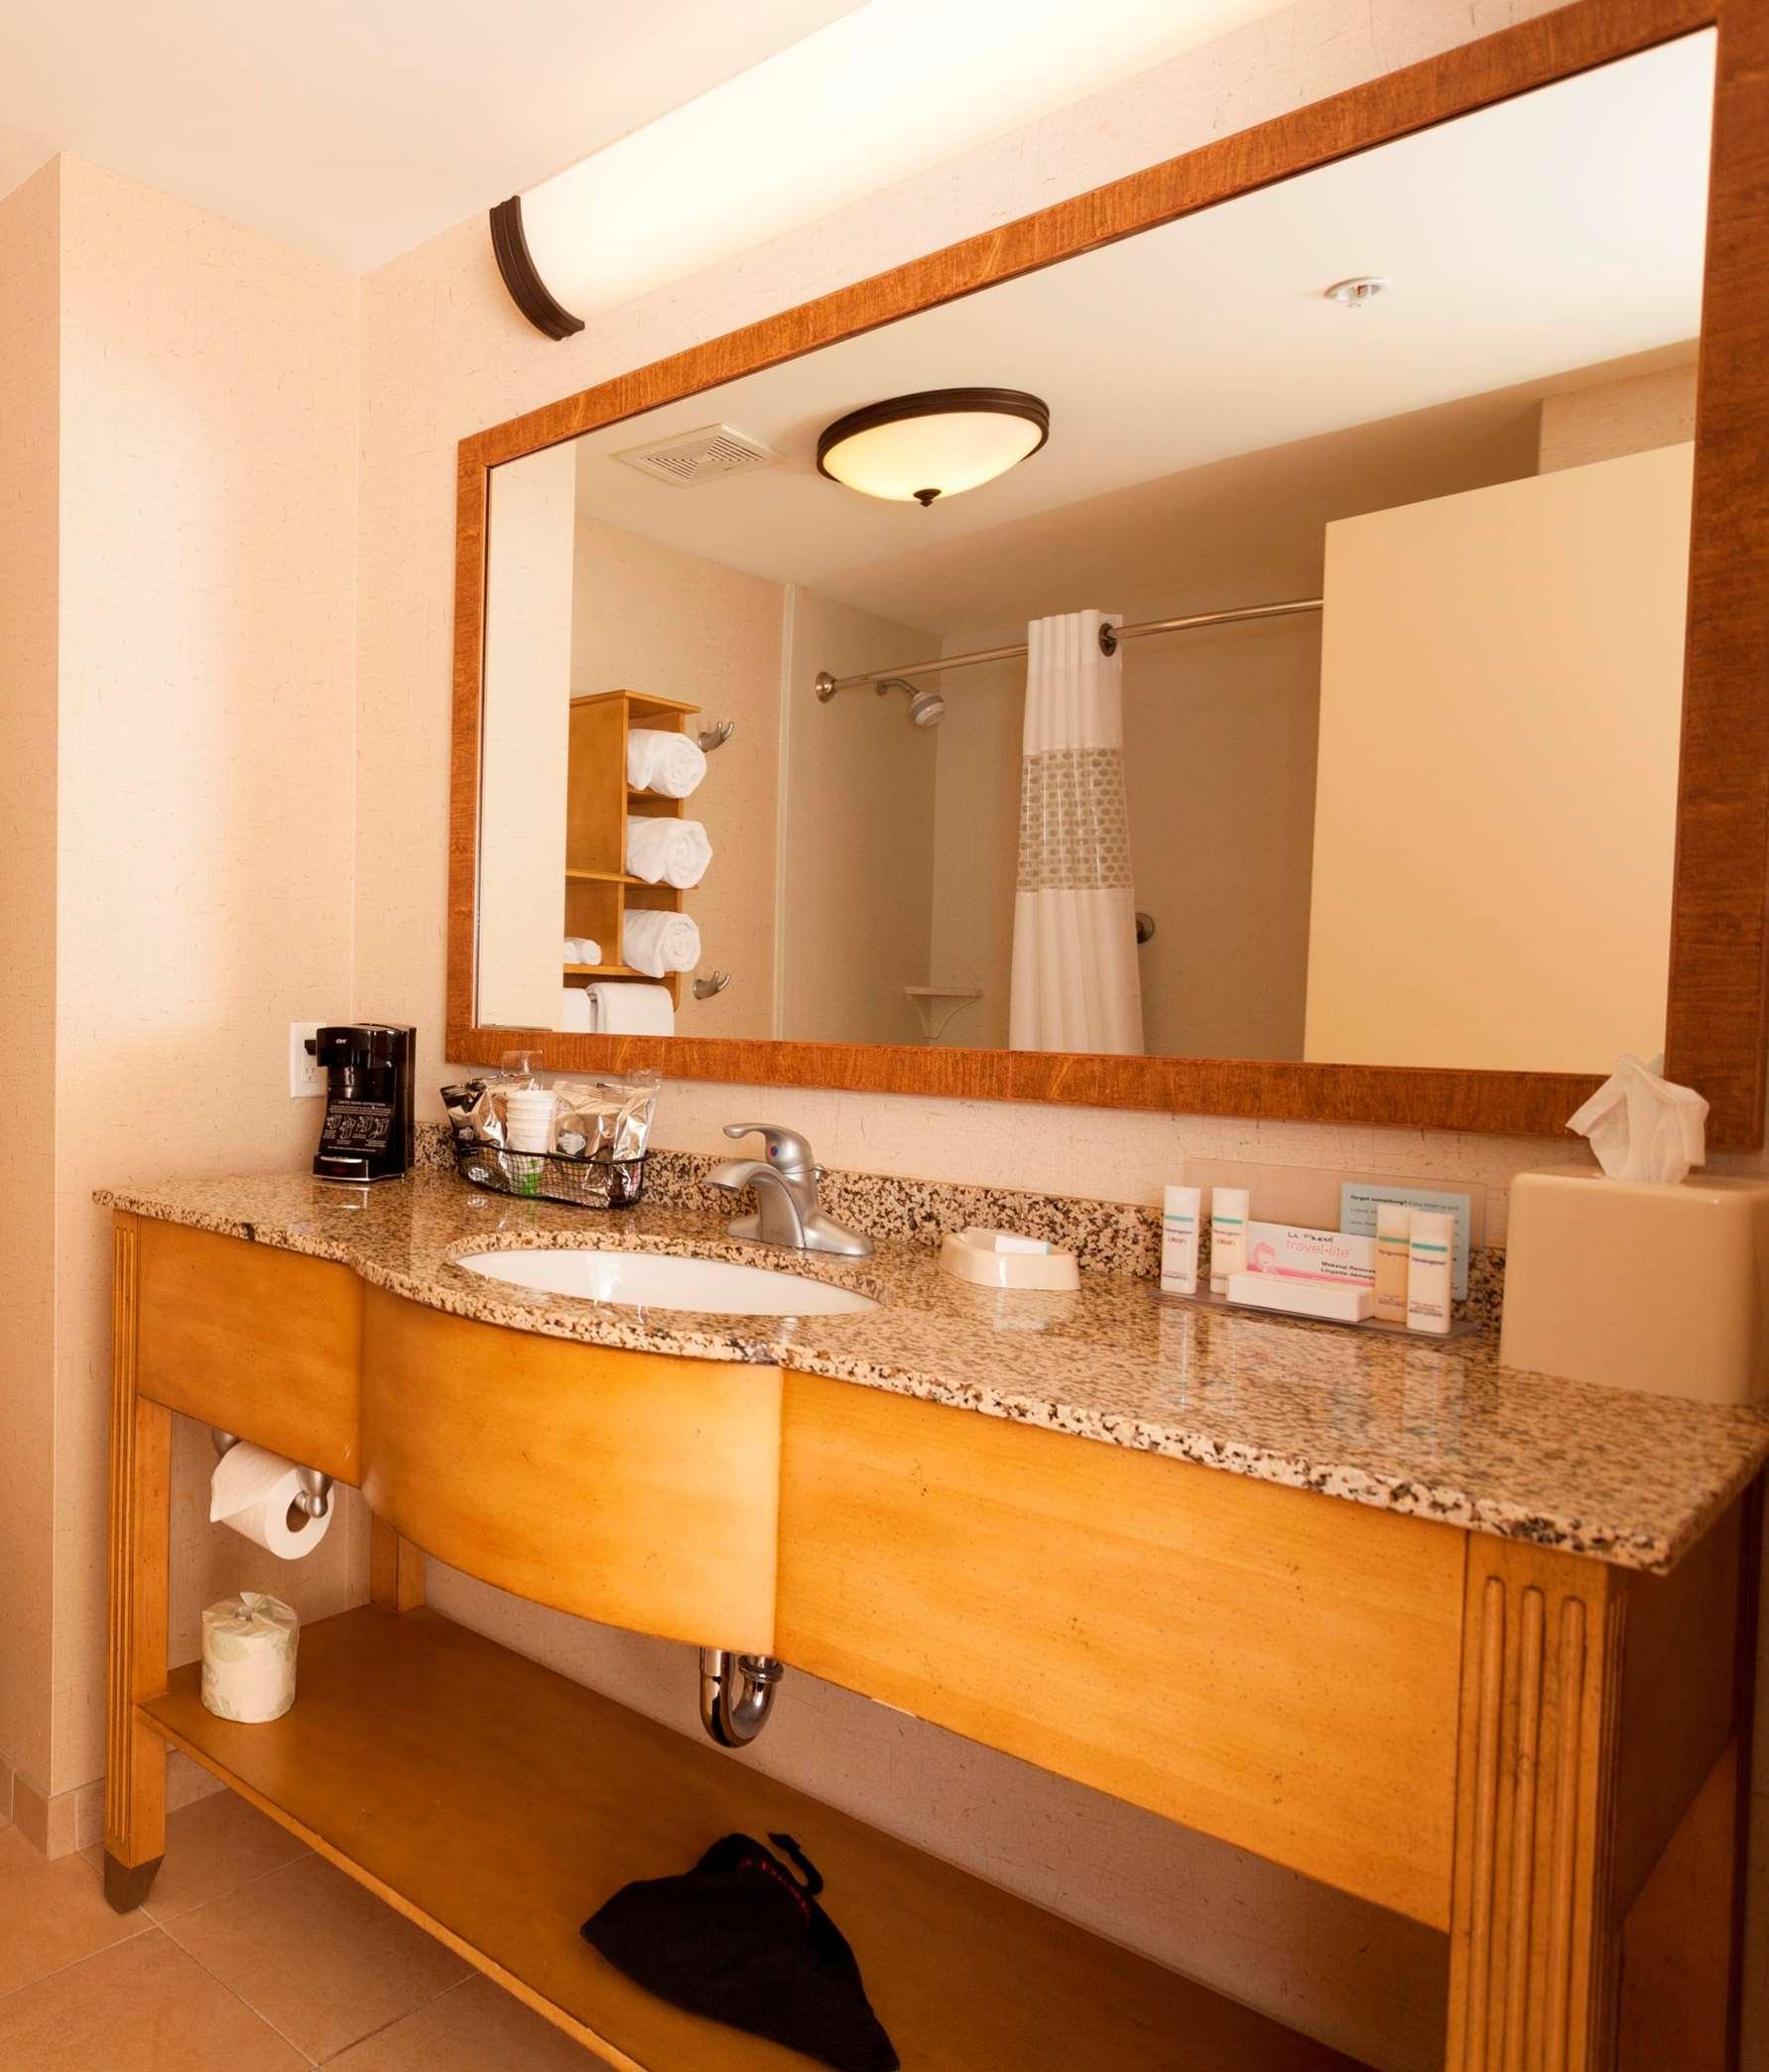 Hampton Inn & Suites Riverton image 38